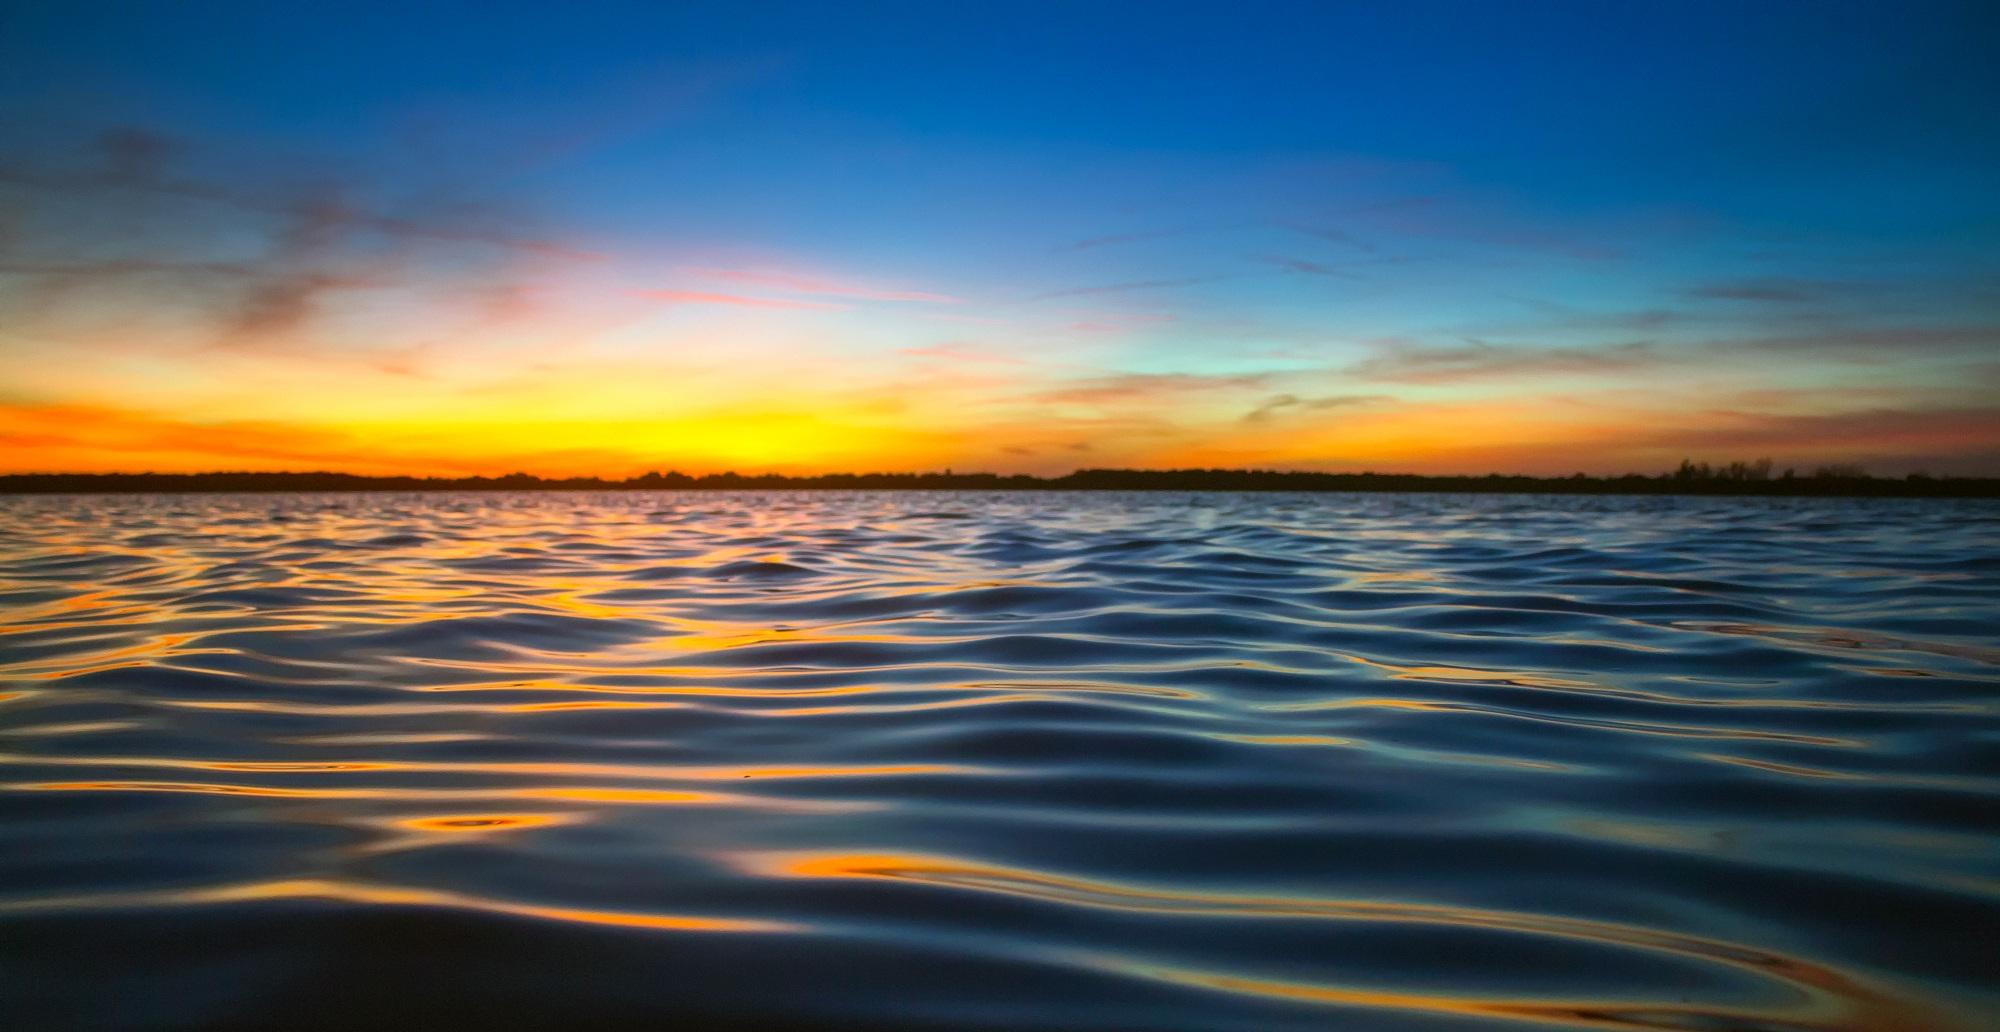 фото закат рассвет вода данном